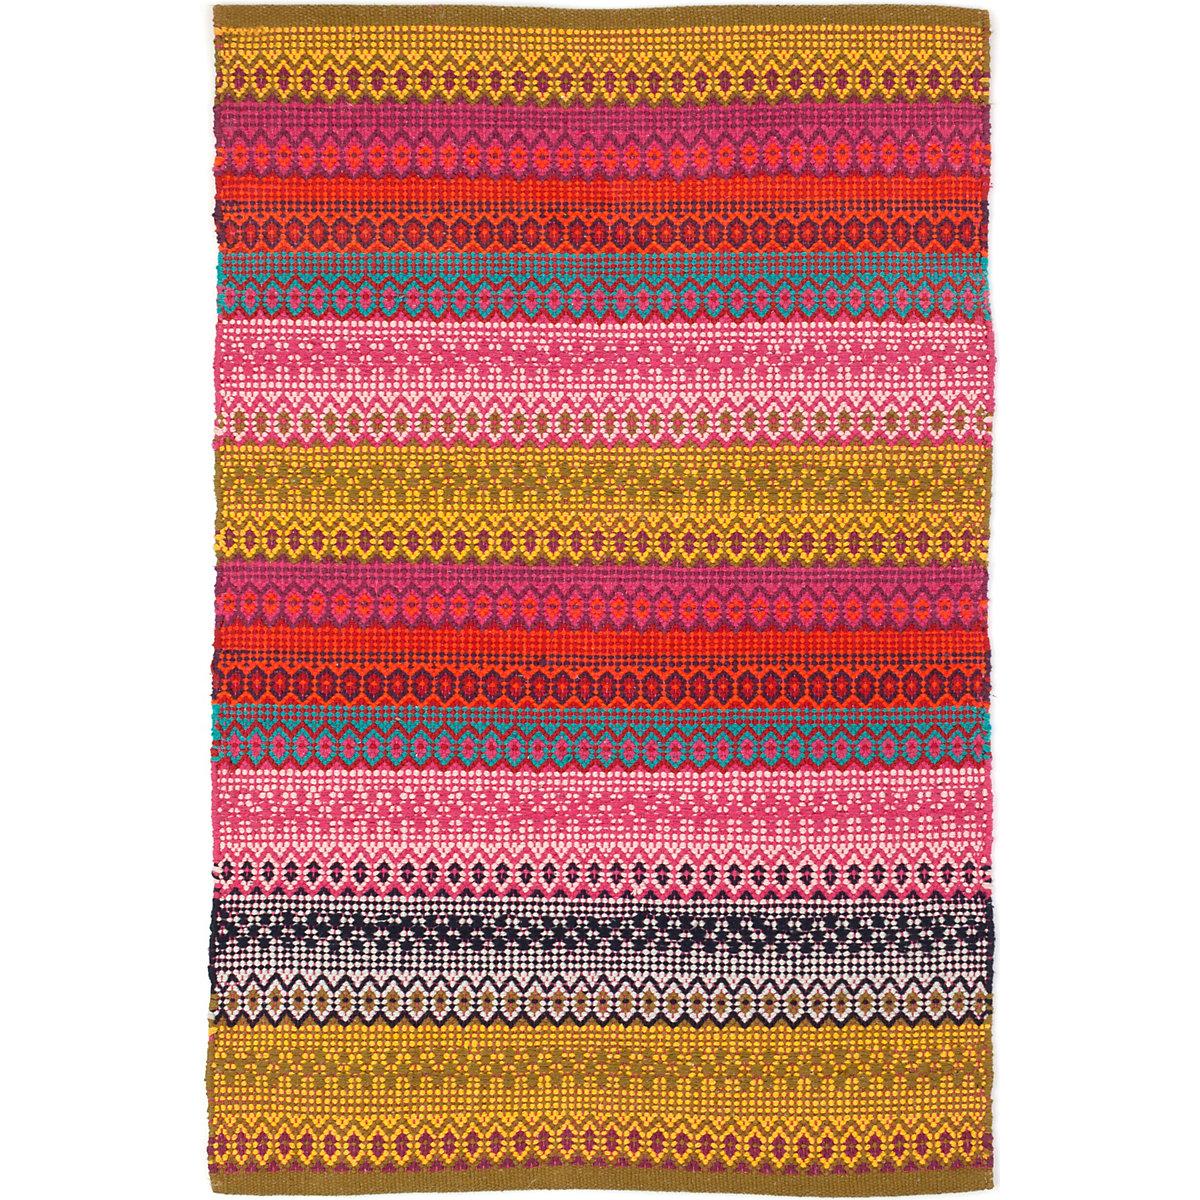 Gypsy Stripe Woven Cotton Rug Dash Amp Albert